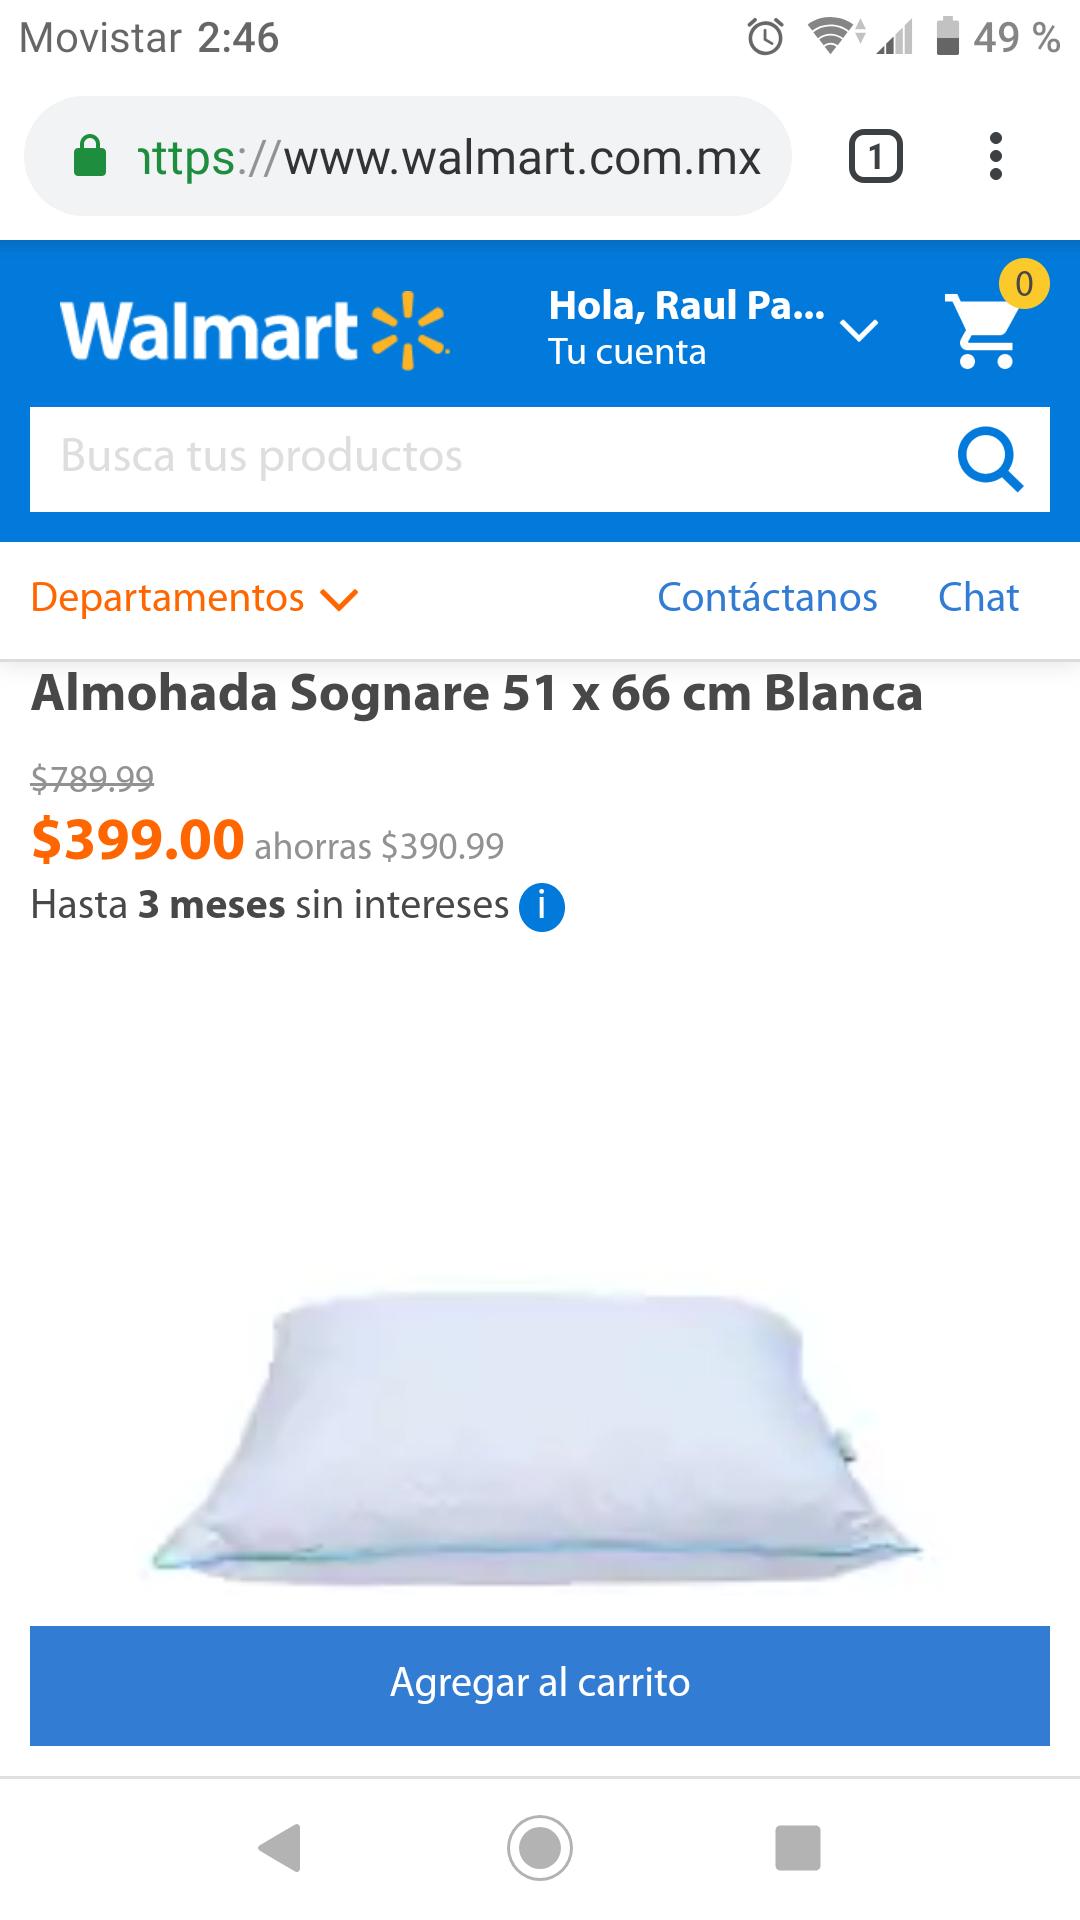 Walmart: Almohada Sognare